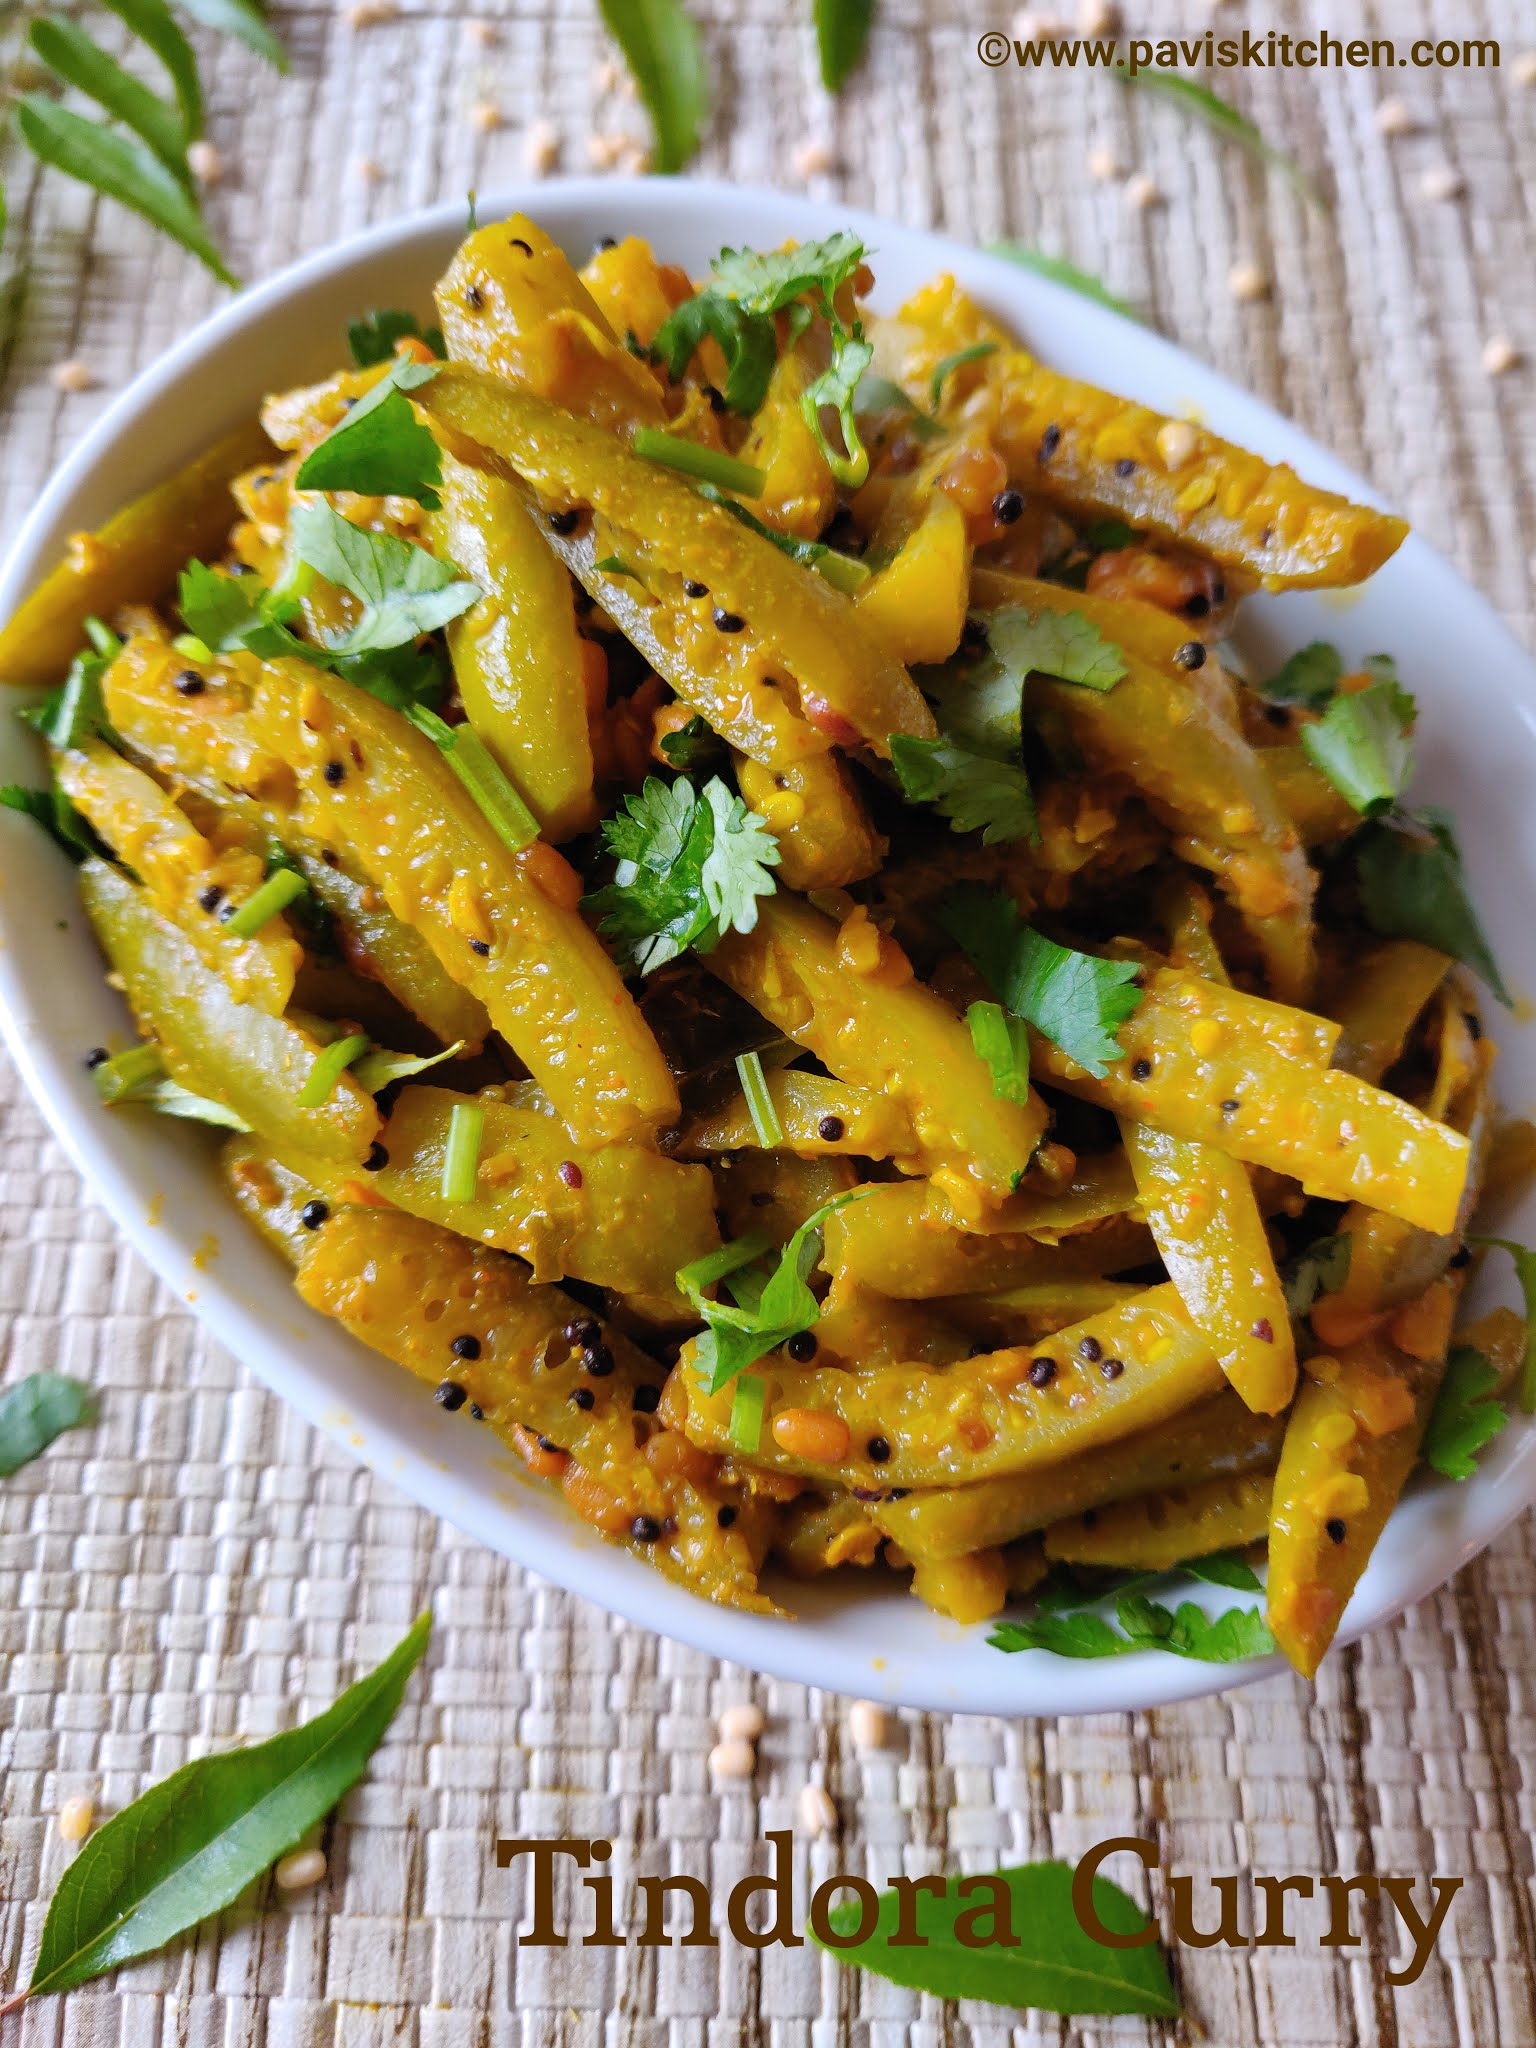 Kovakkai poriyal recipe | Thondekai palya recipe | Kovakkai fry recipe | Tindora fry recipe